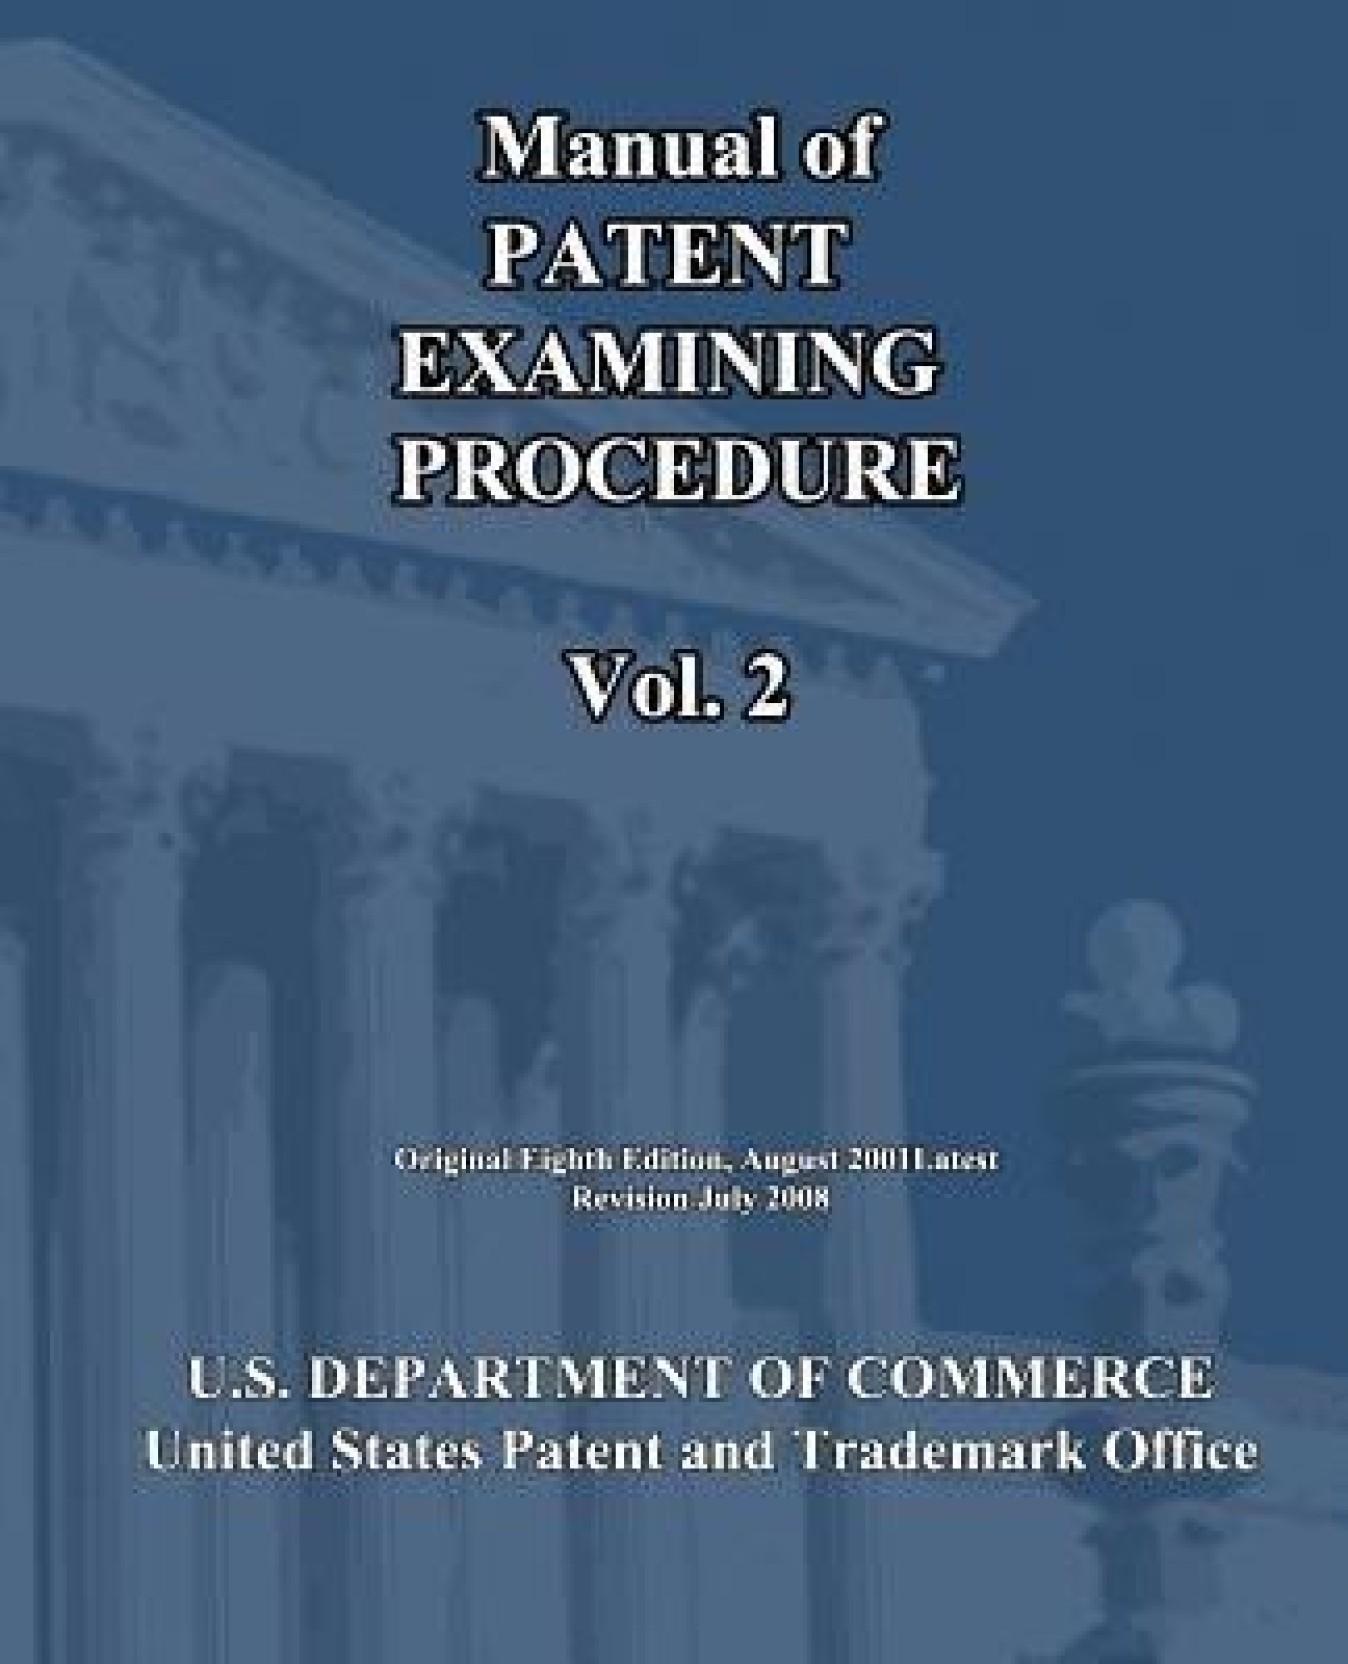 Manual of Patent Examining Procedure (Vol.2). Share